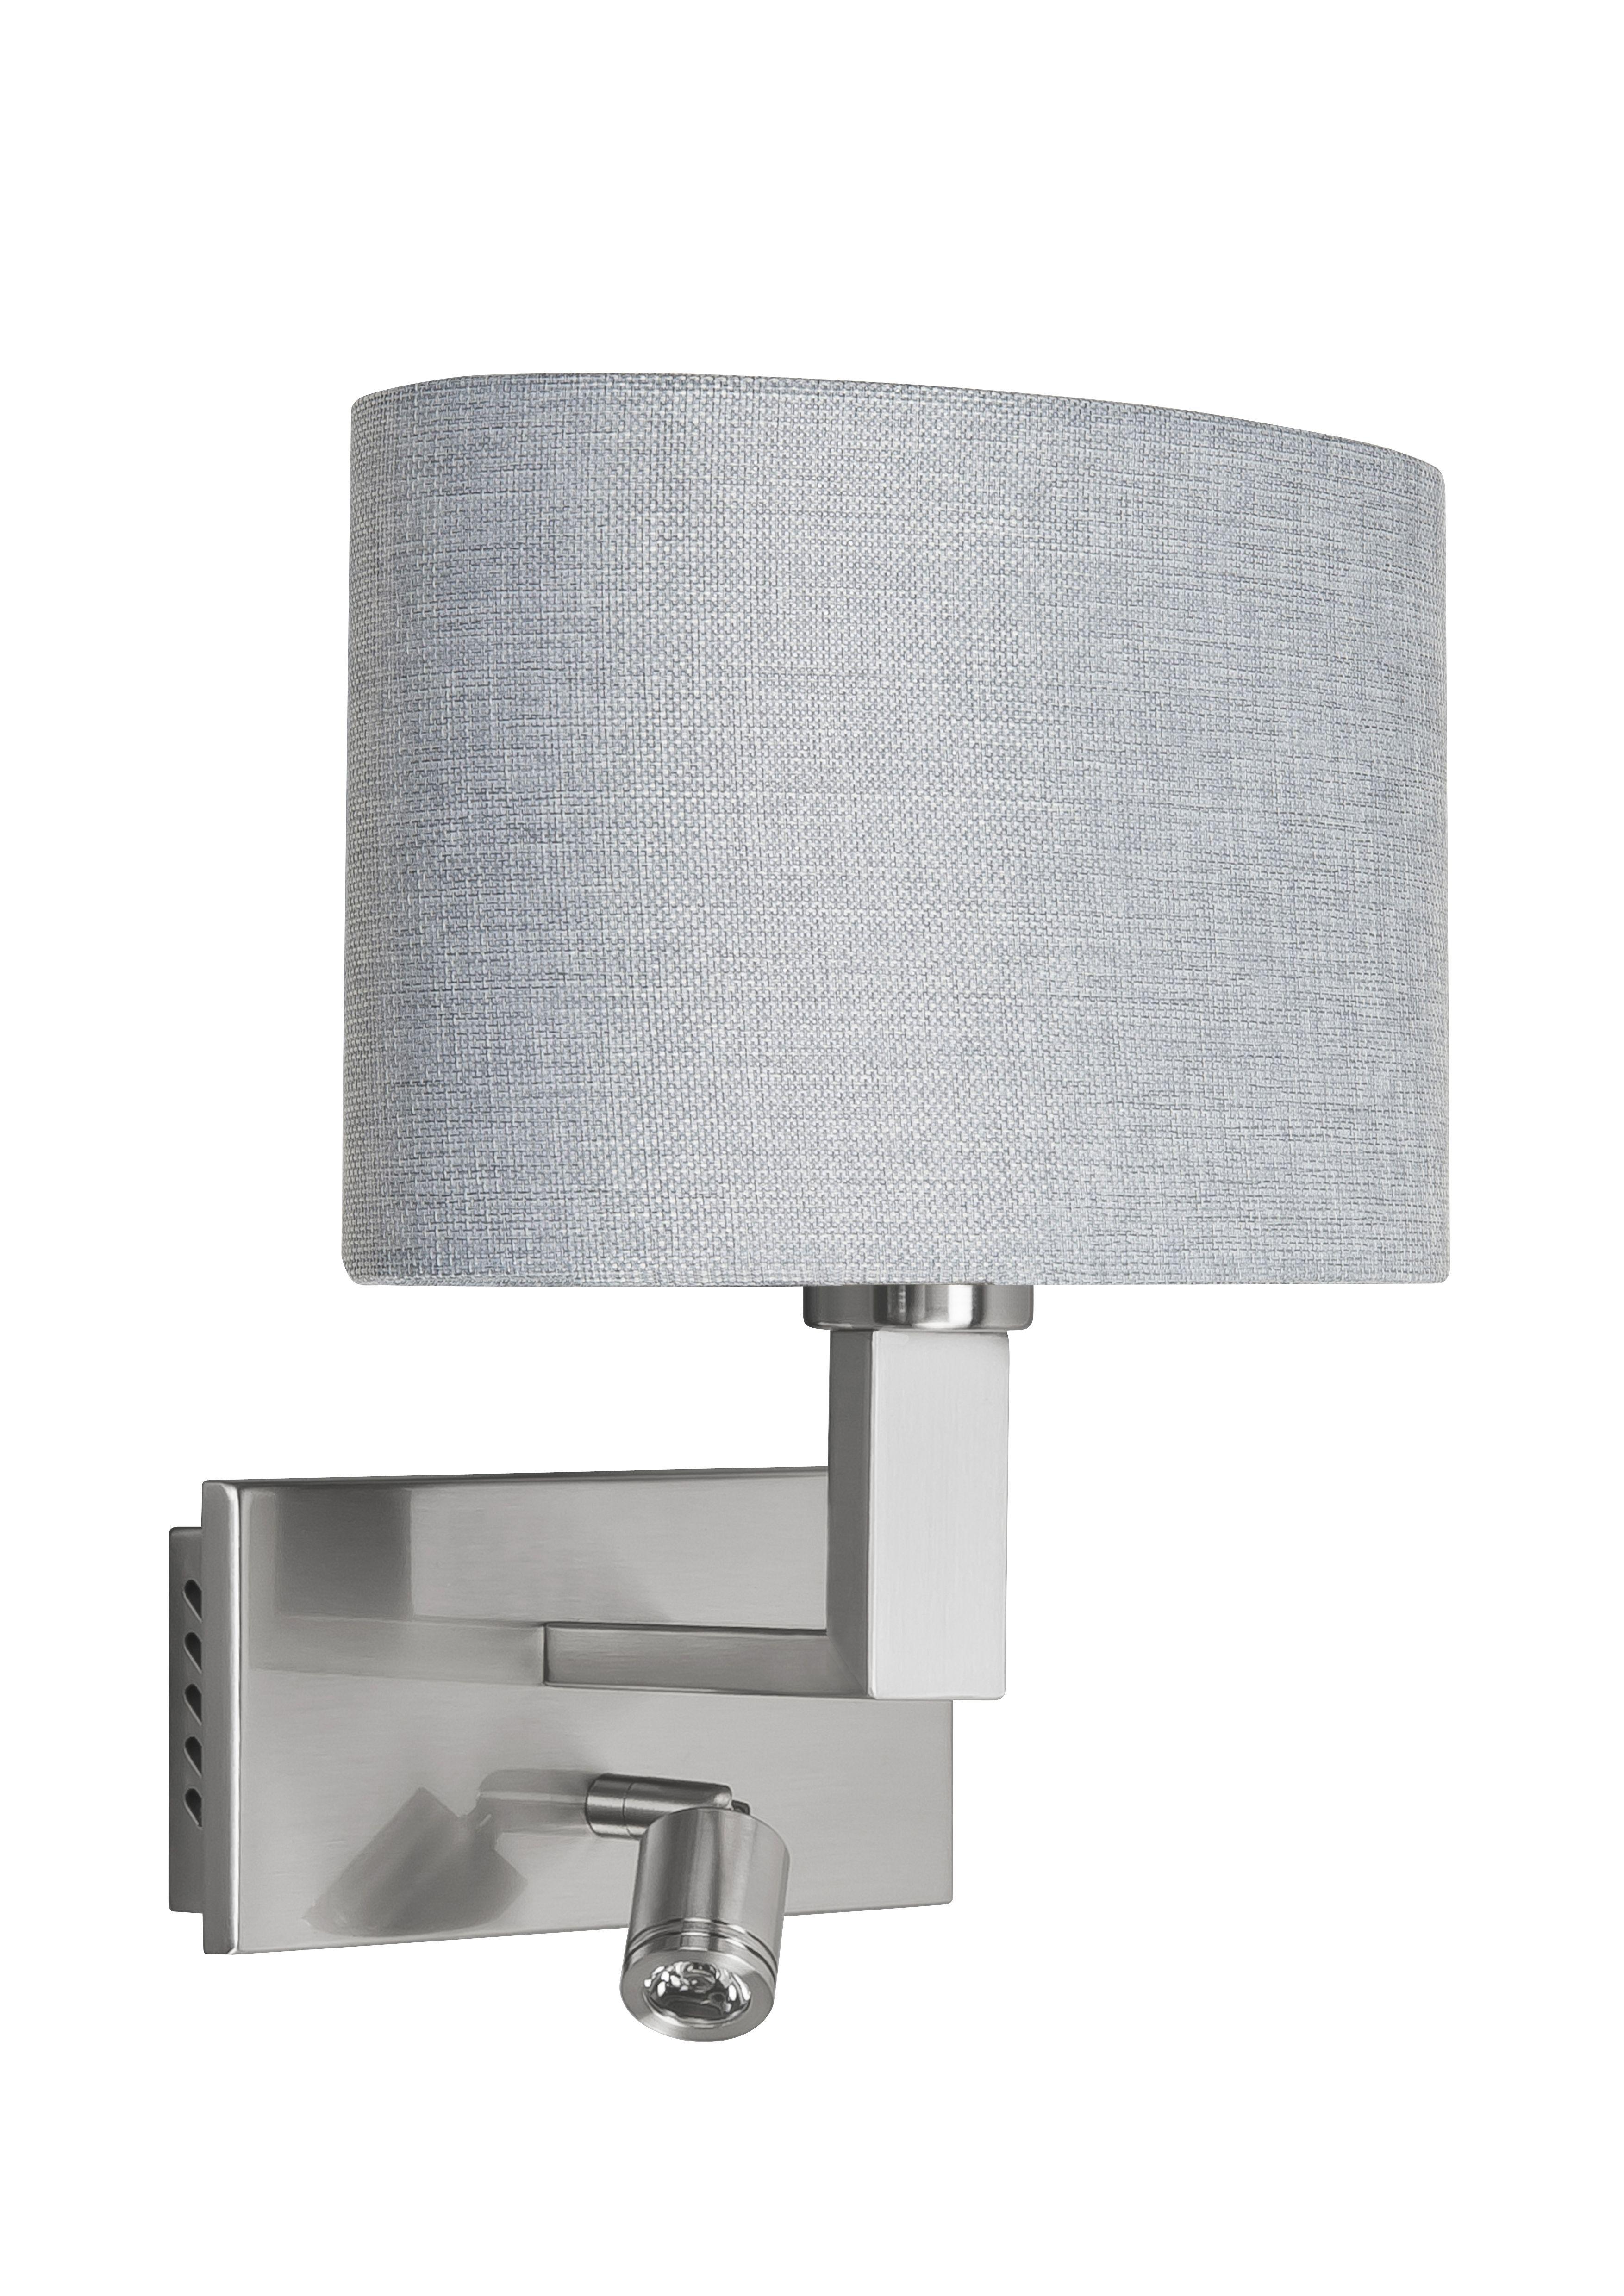 HighLight wandlamp New Oval met leeslamp - grijs - mat staal